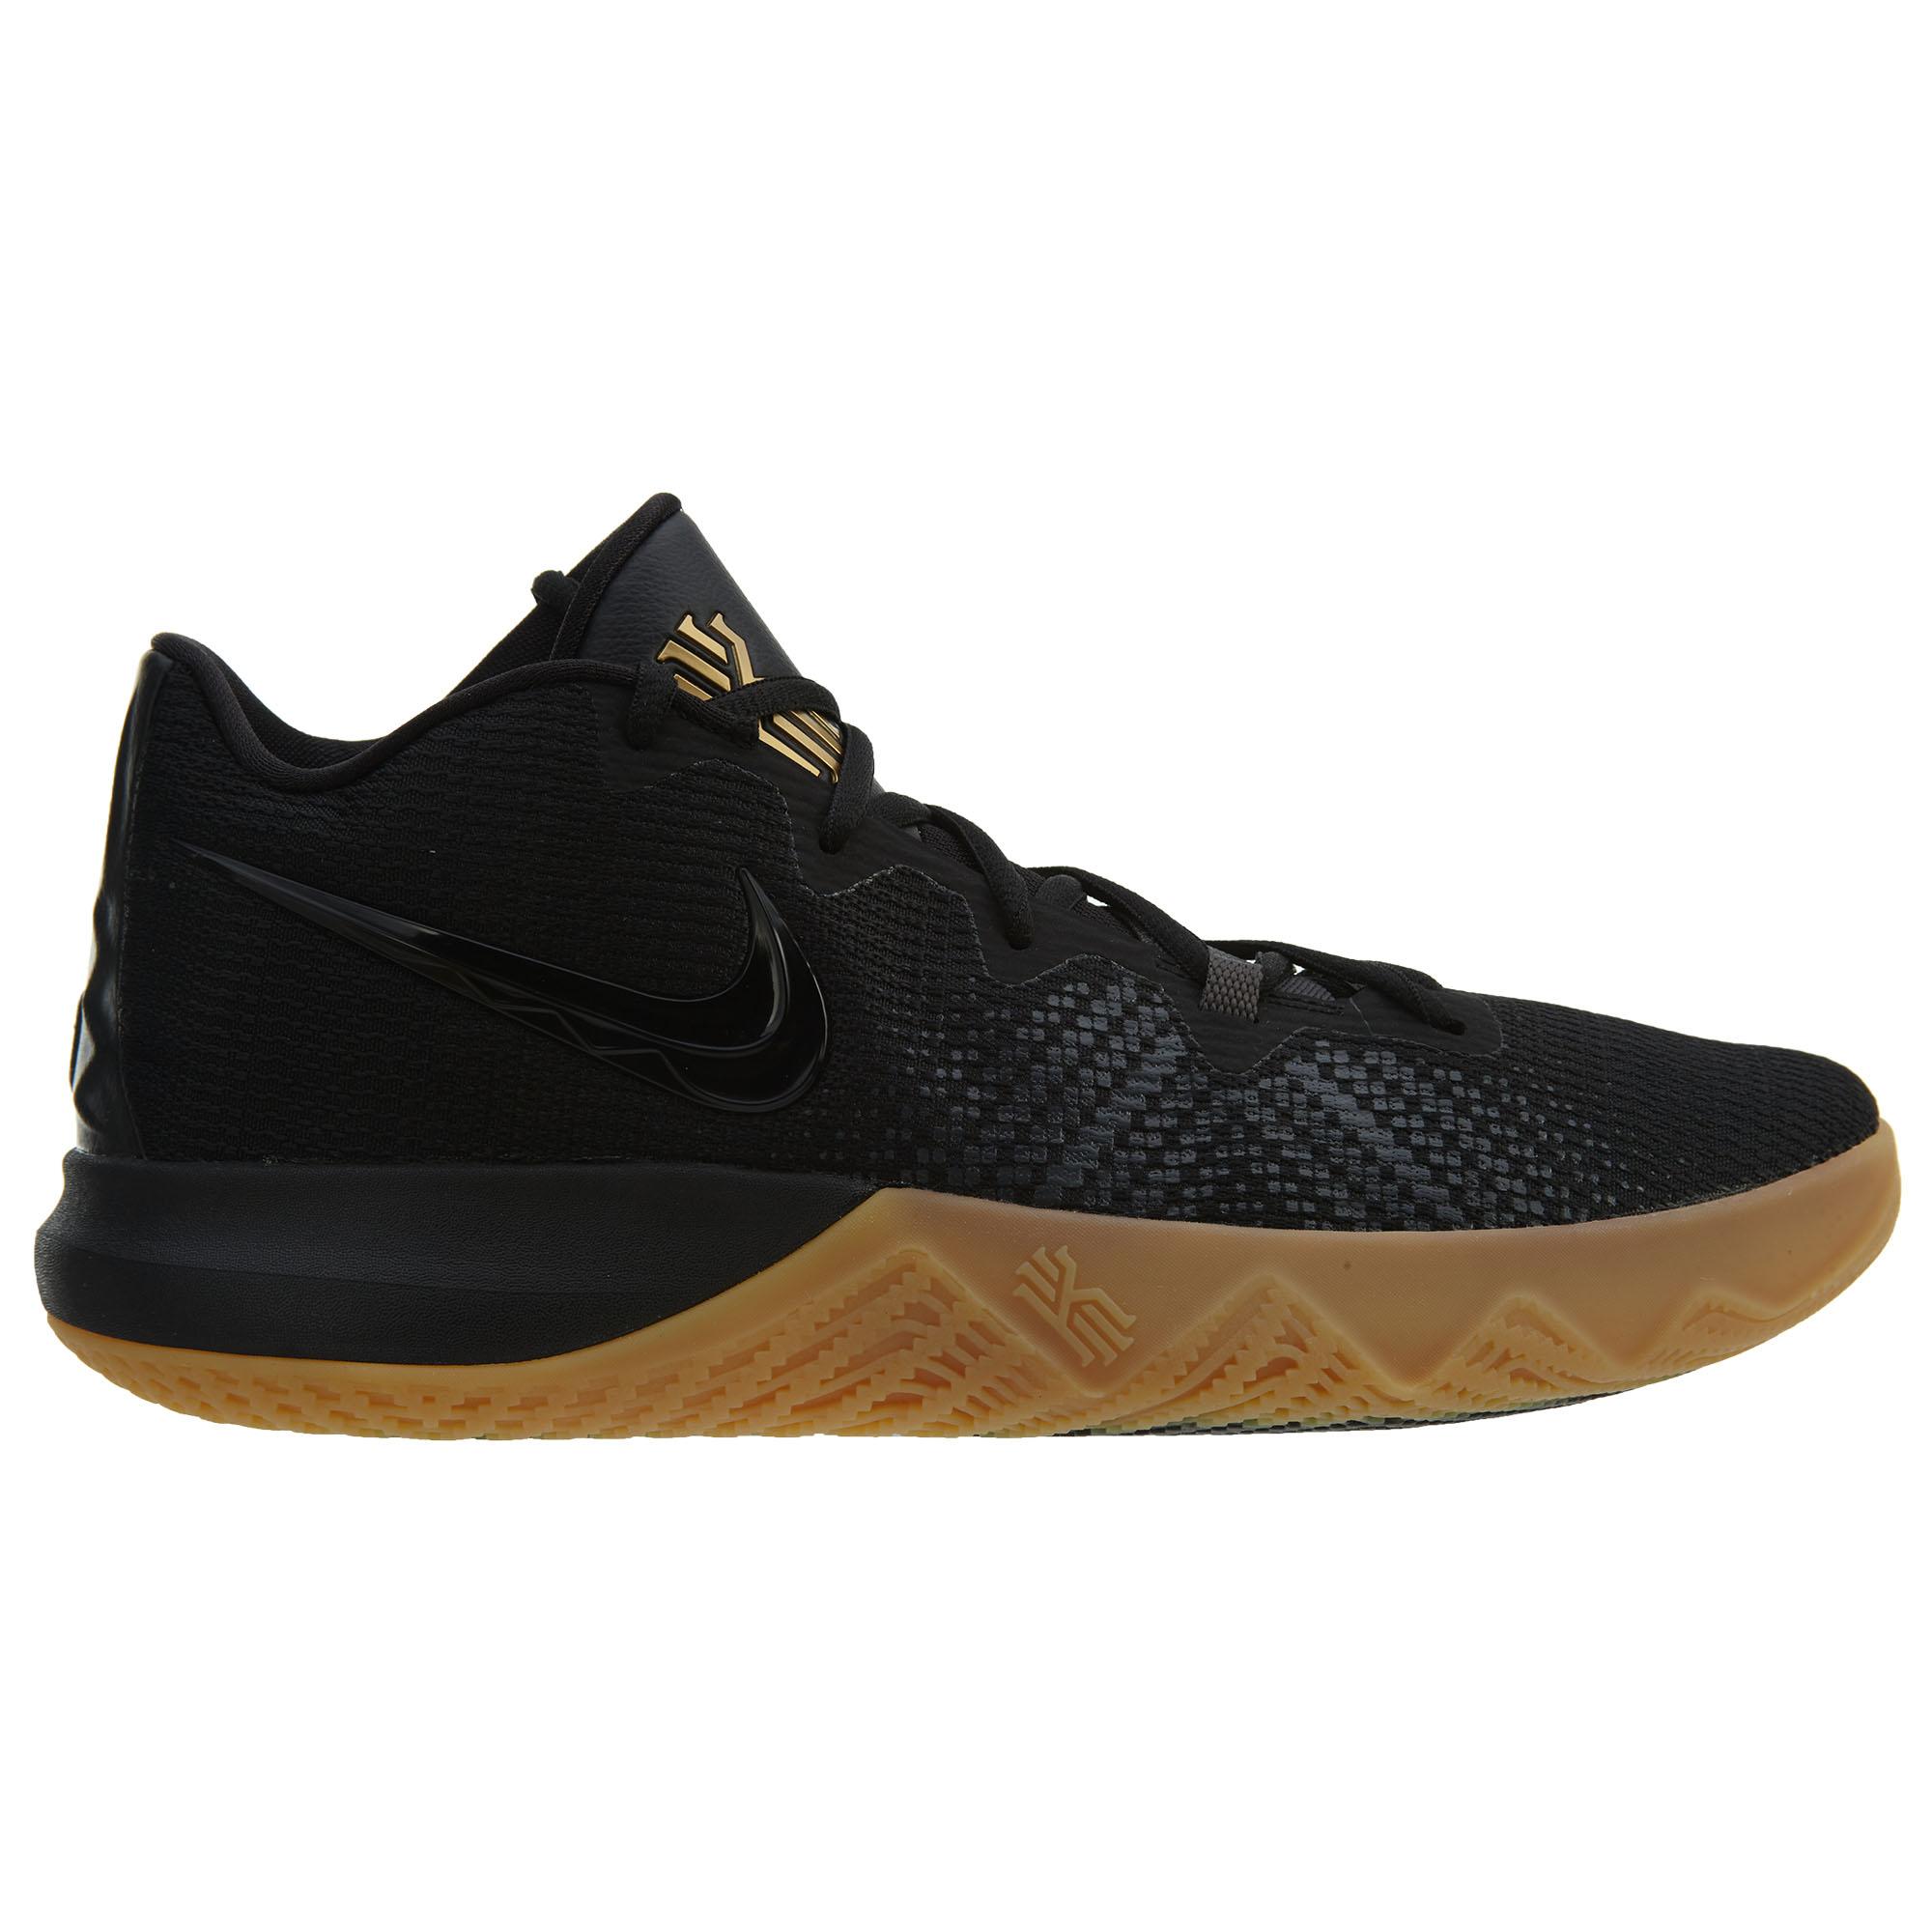 Nike Kyrie Flytrap Black Black-Metallic